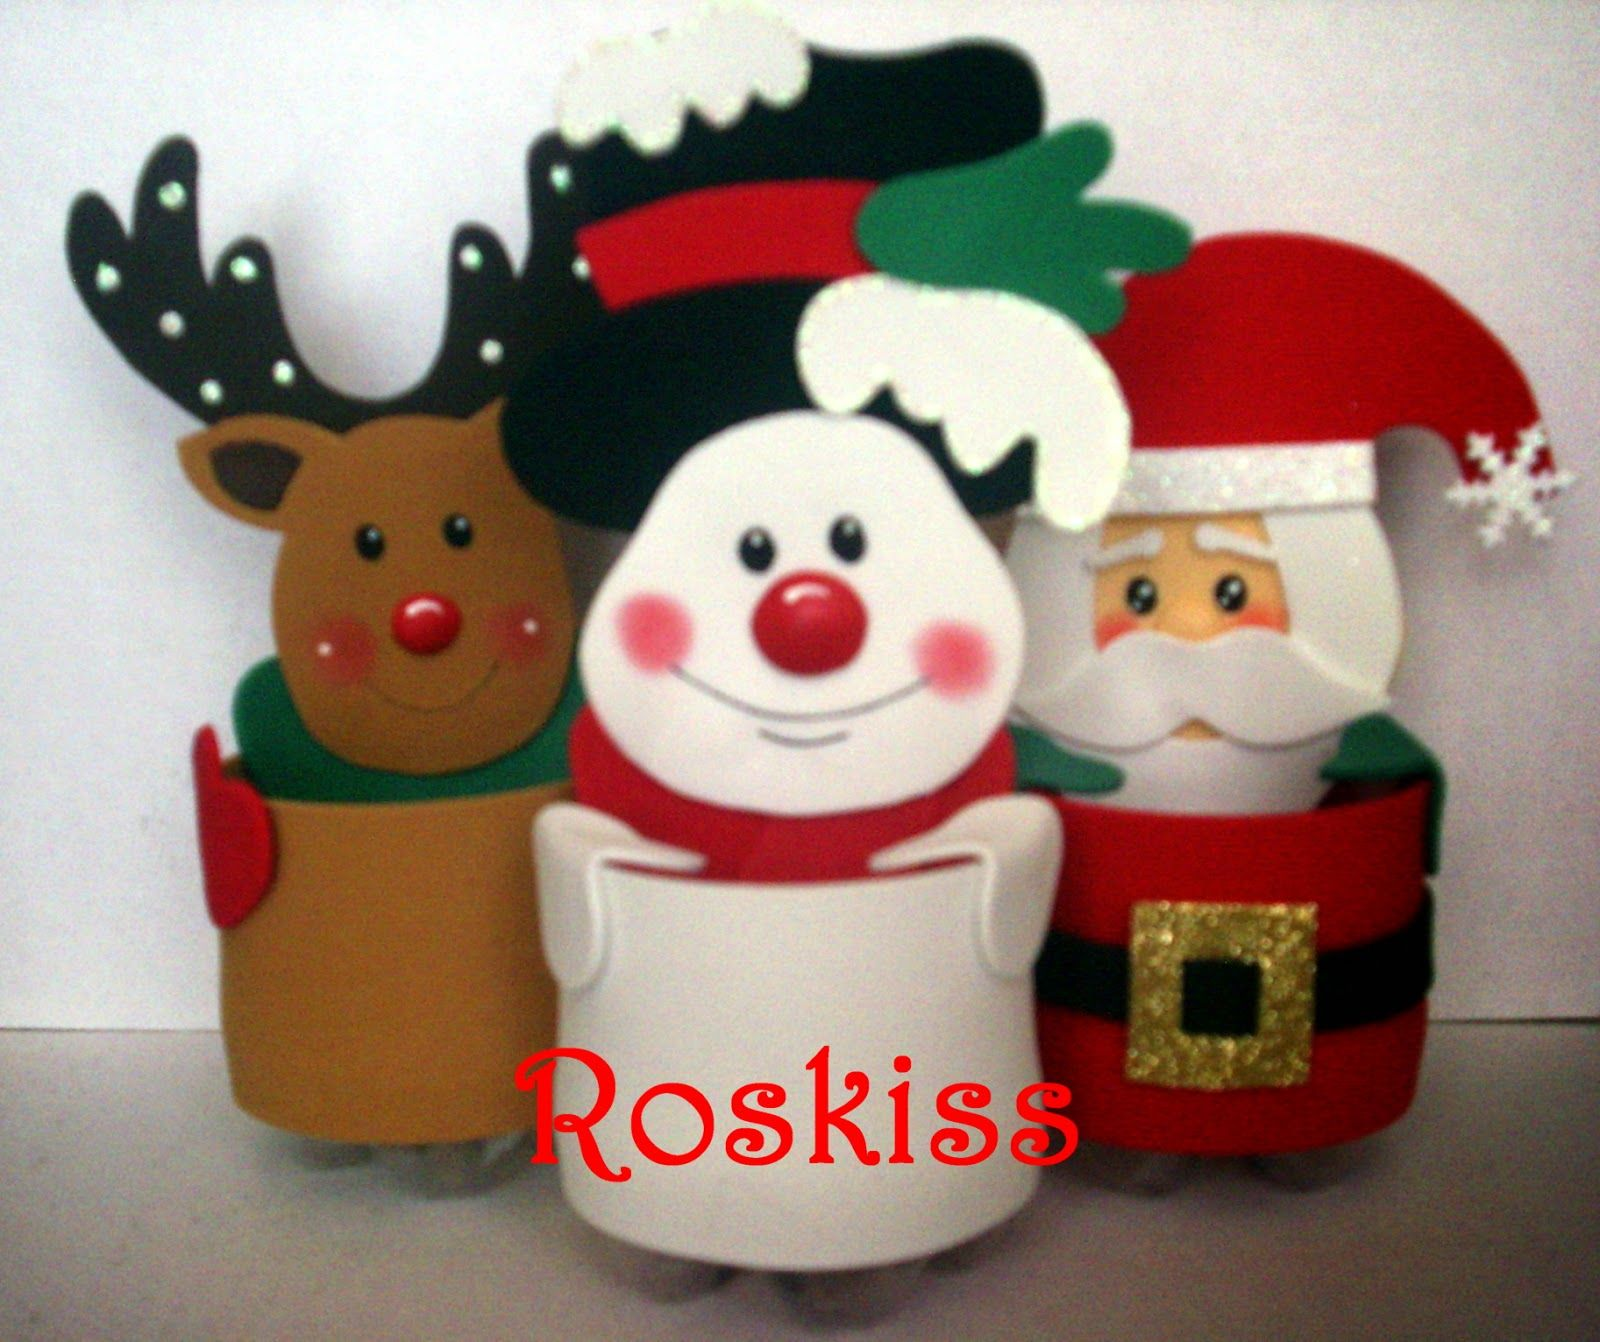 Manualidades con botellas de refresco buscar con google - Decoracion navidad infantil manualidades ...